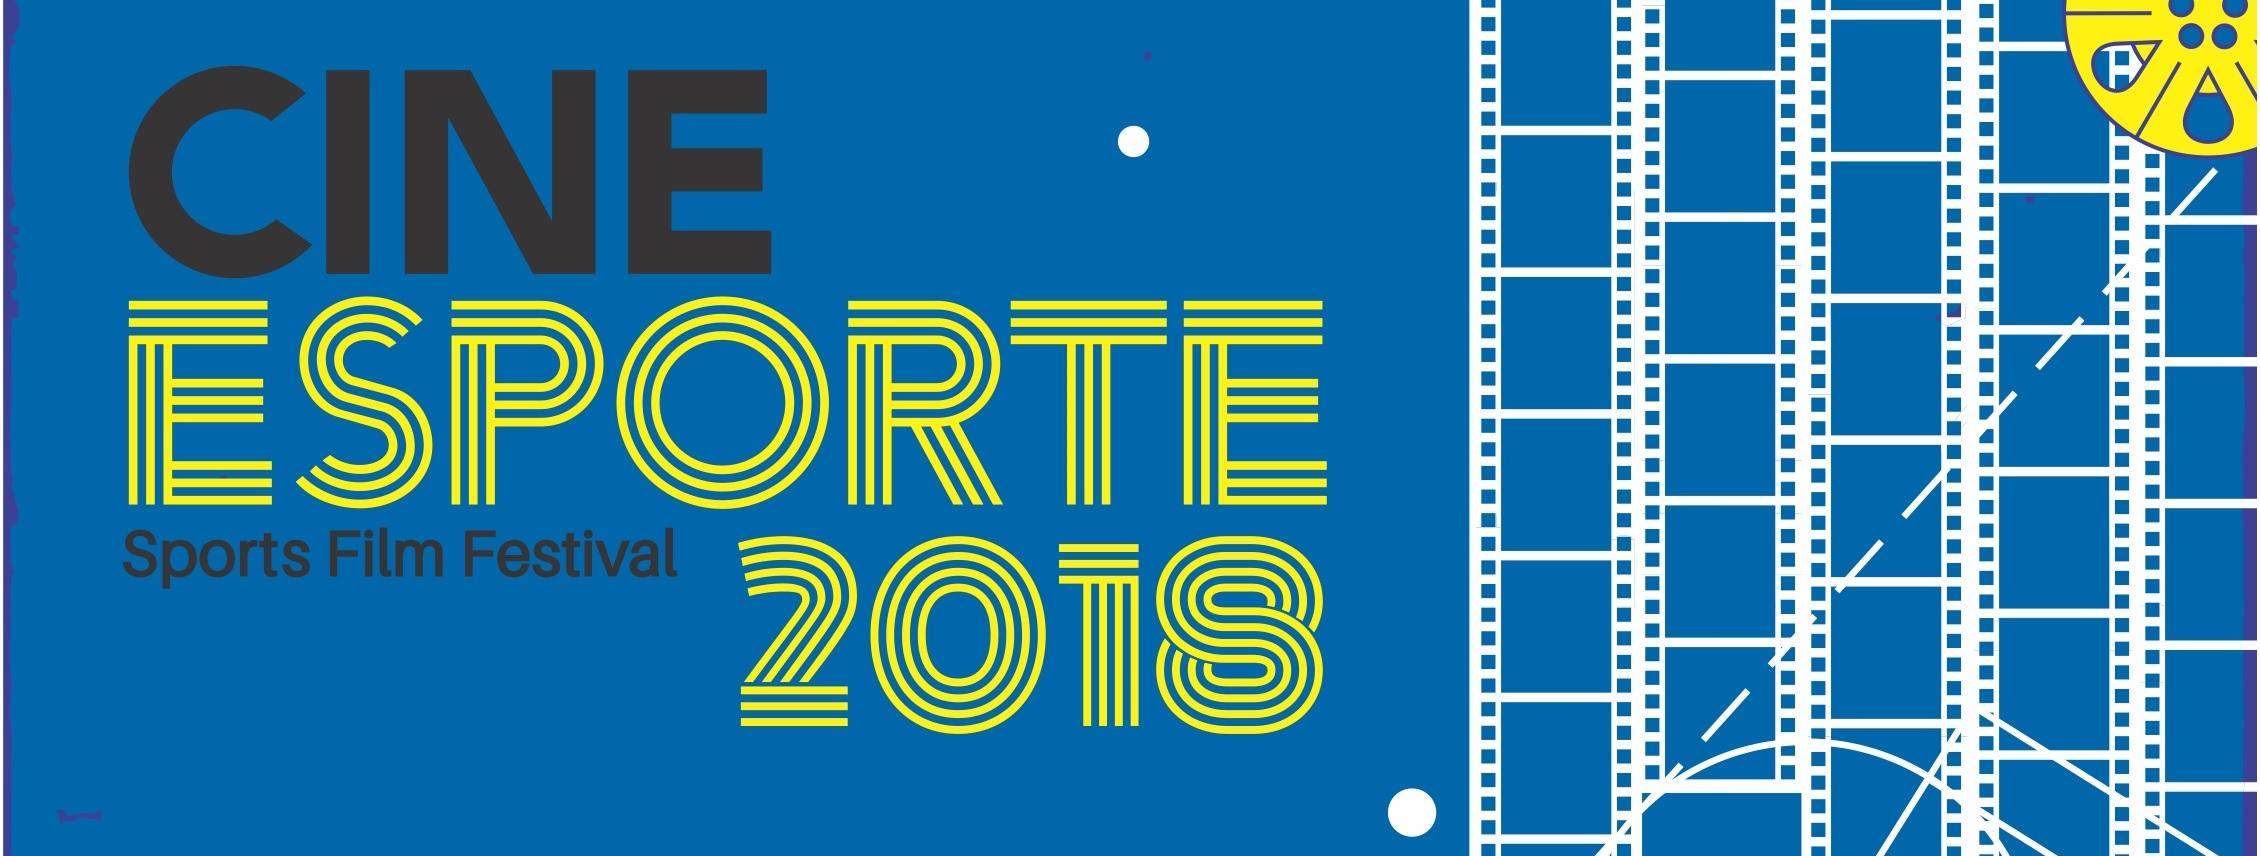 CINEESPORTE 2018-capa